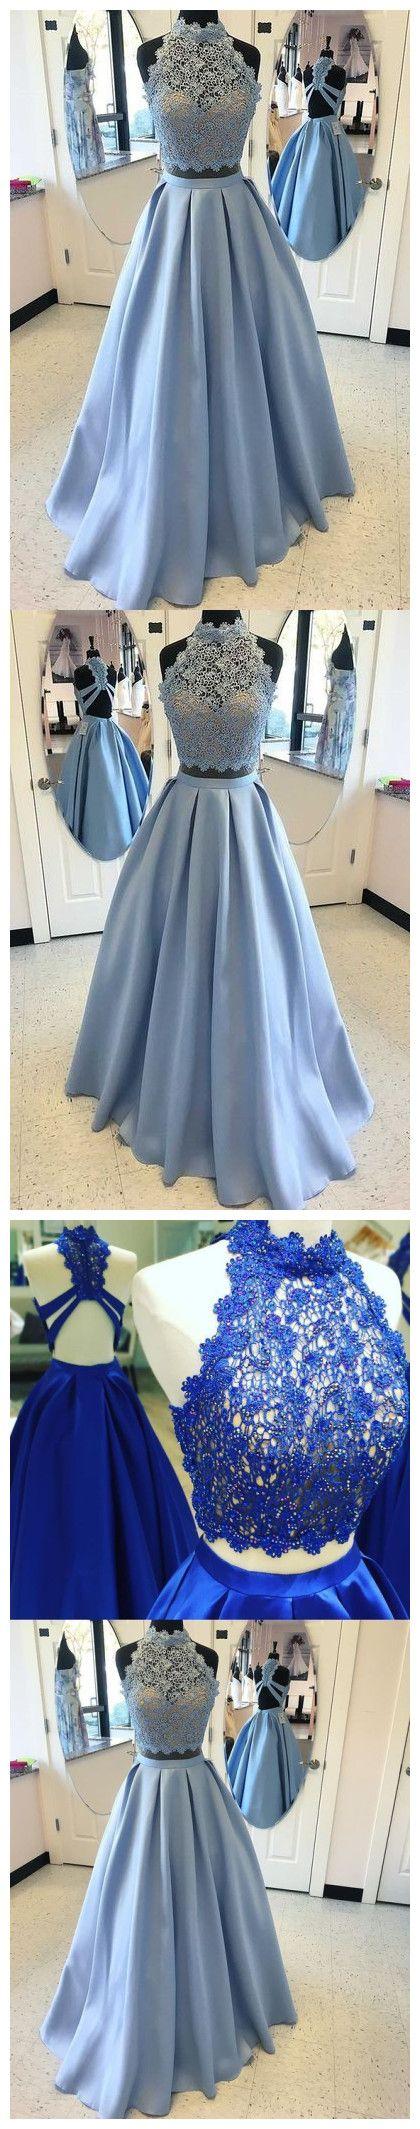 Prom dresseslight blue prom dressnew prom gown pieces prom